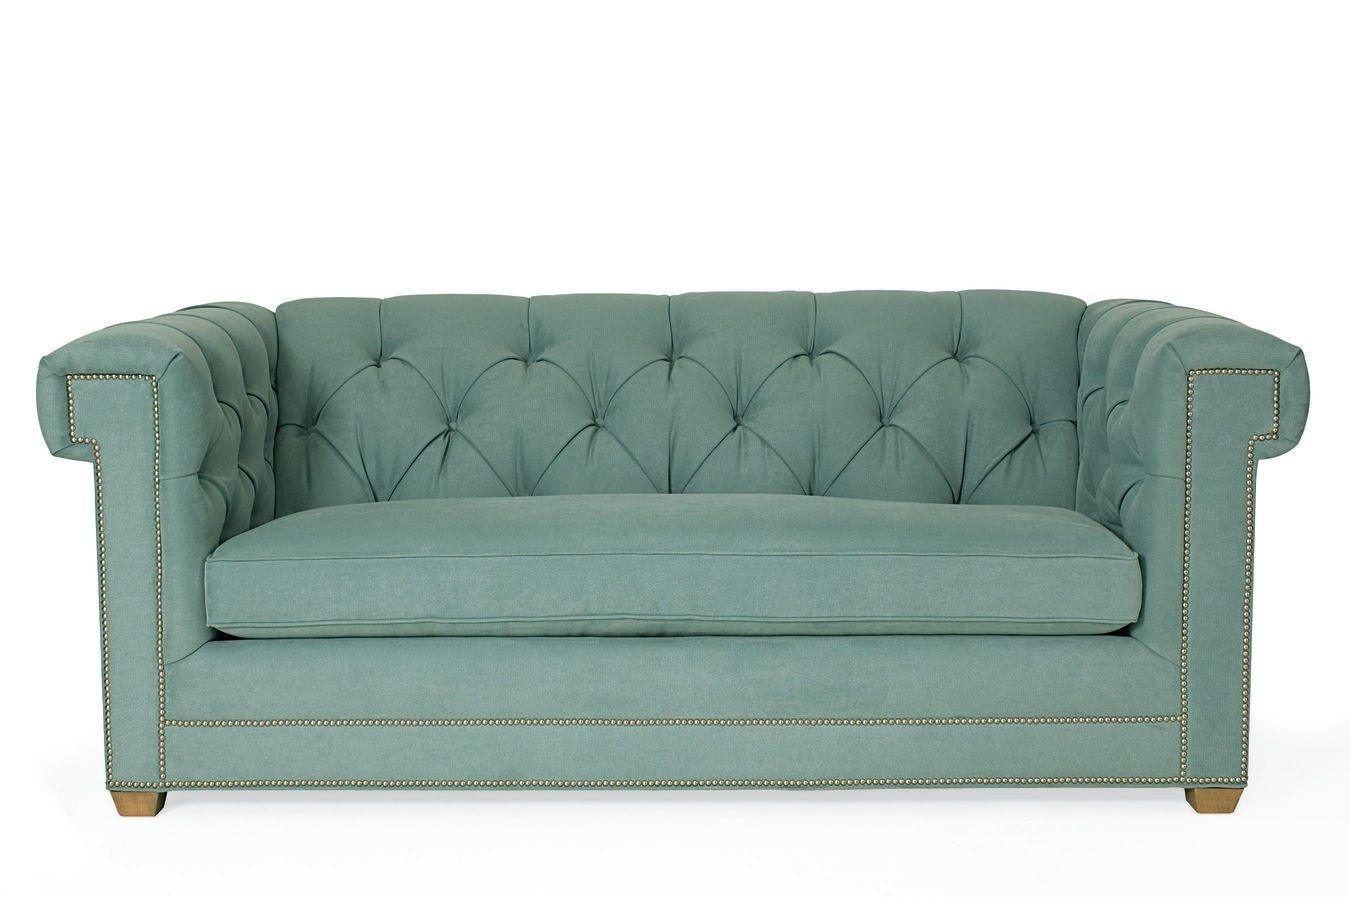 schnadig sofa 9090 htl thomasville living room ella 1718 11 whitley